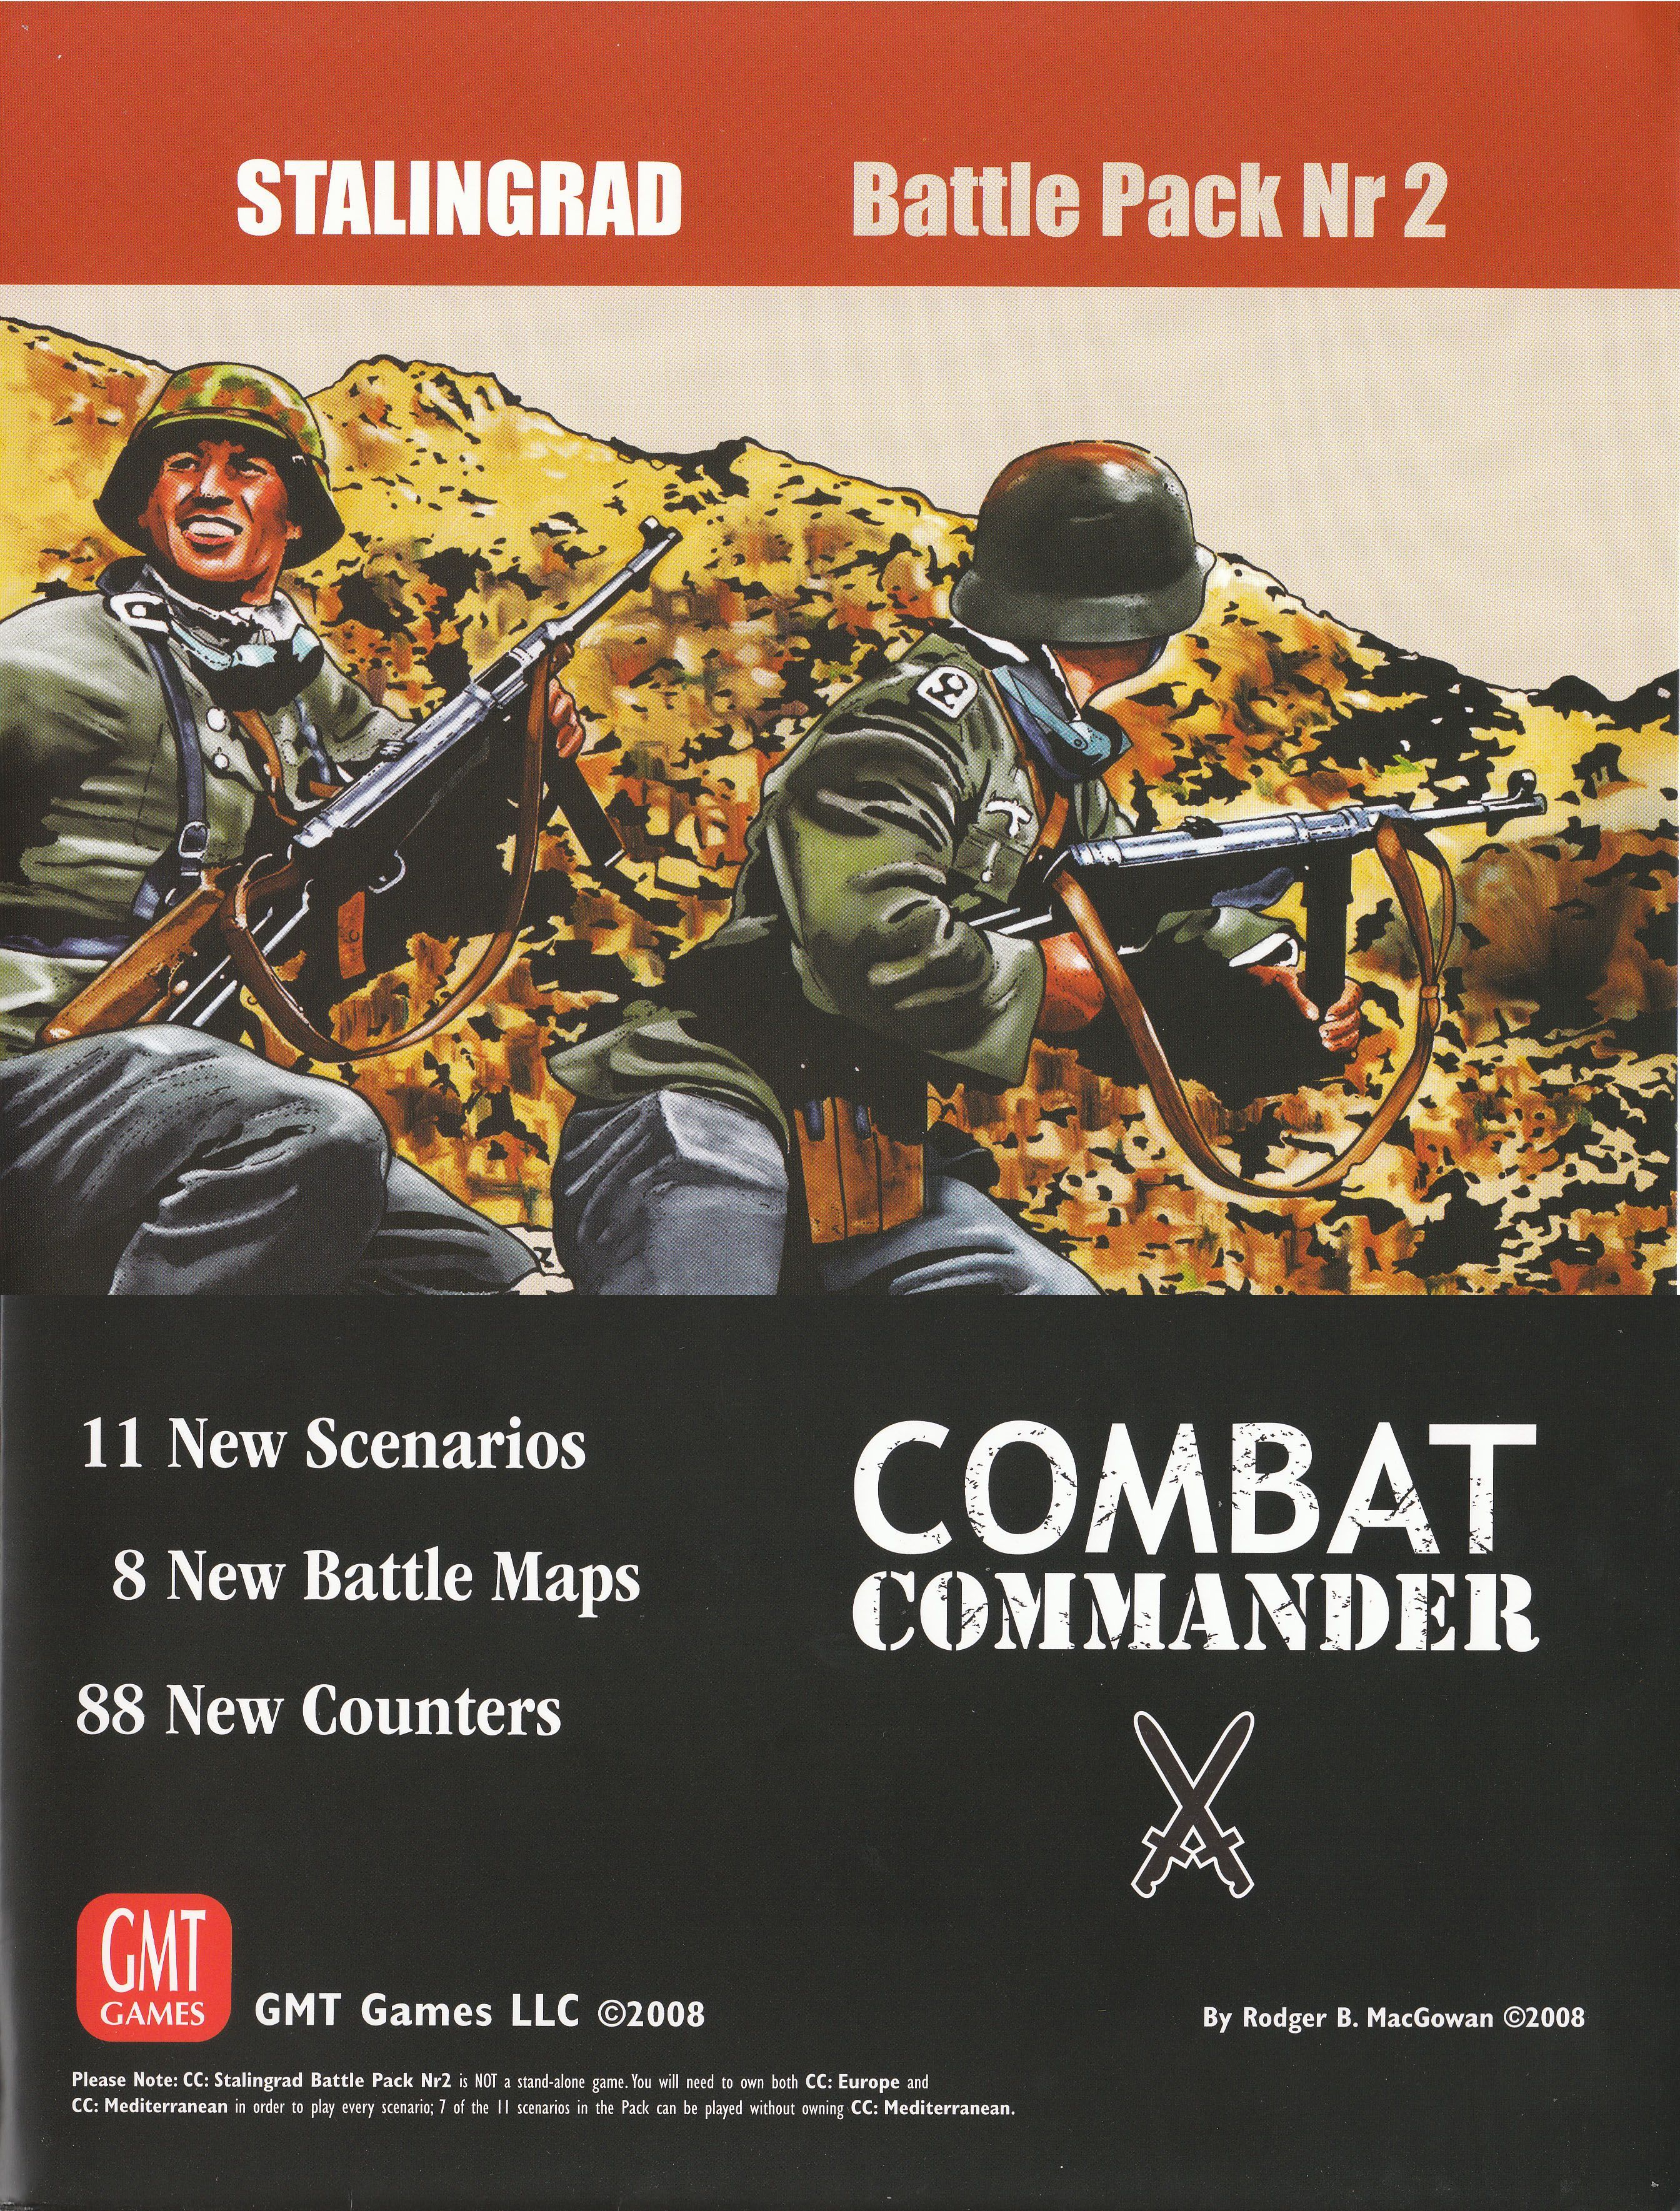 Combat Commander: Battle Pack #2 – Stalingrad